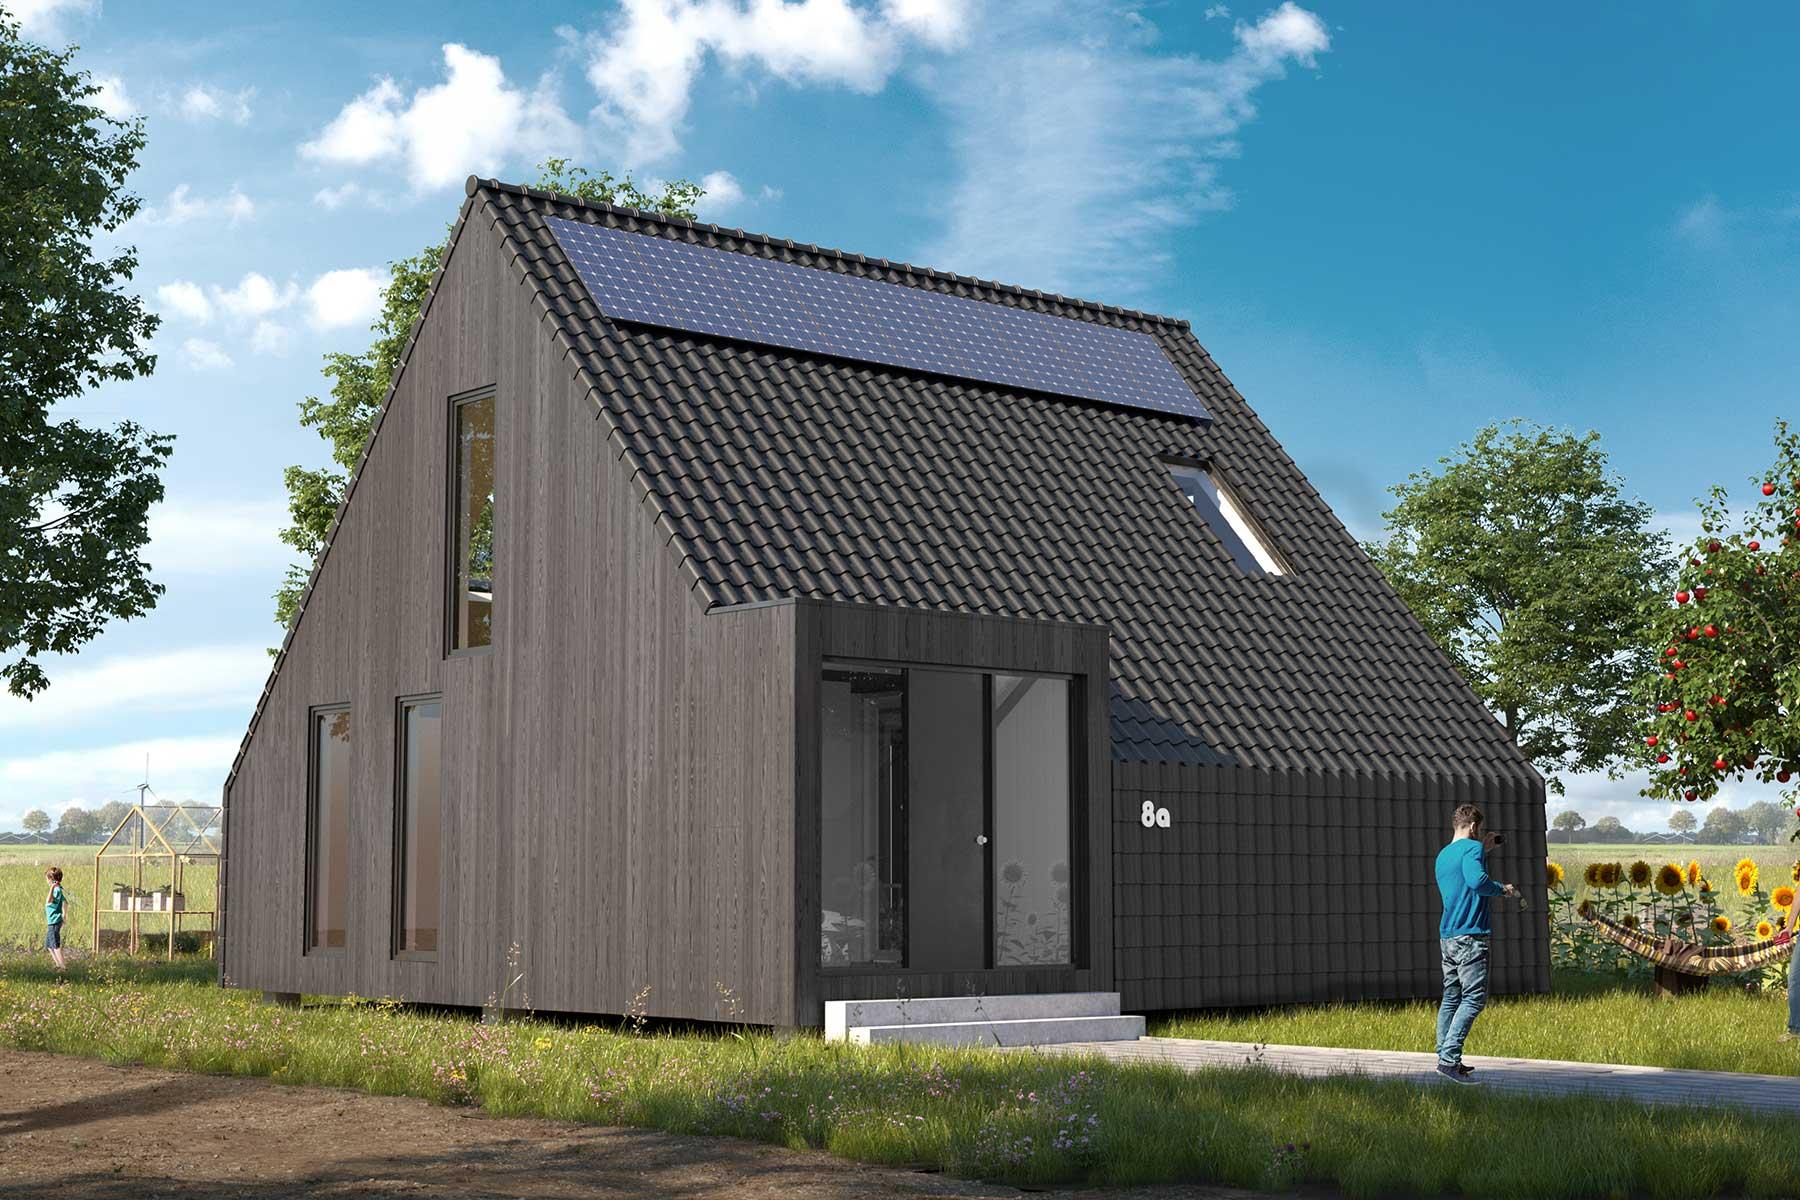 8A Architecten - moderne schuurwoning